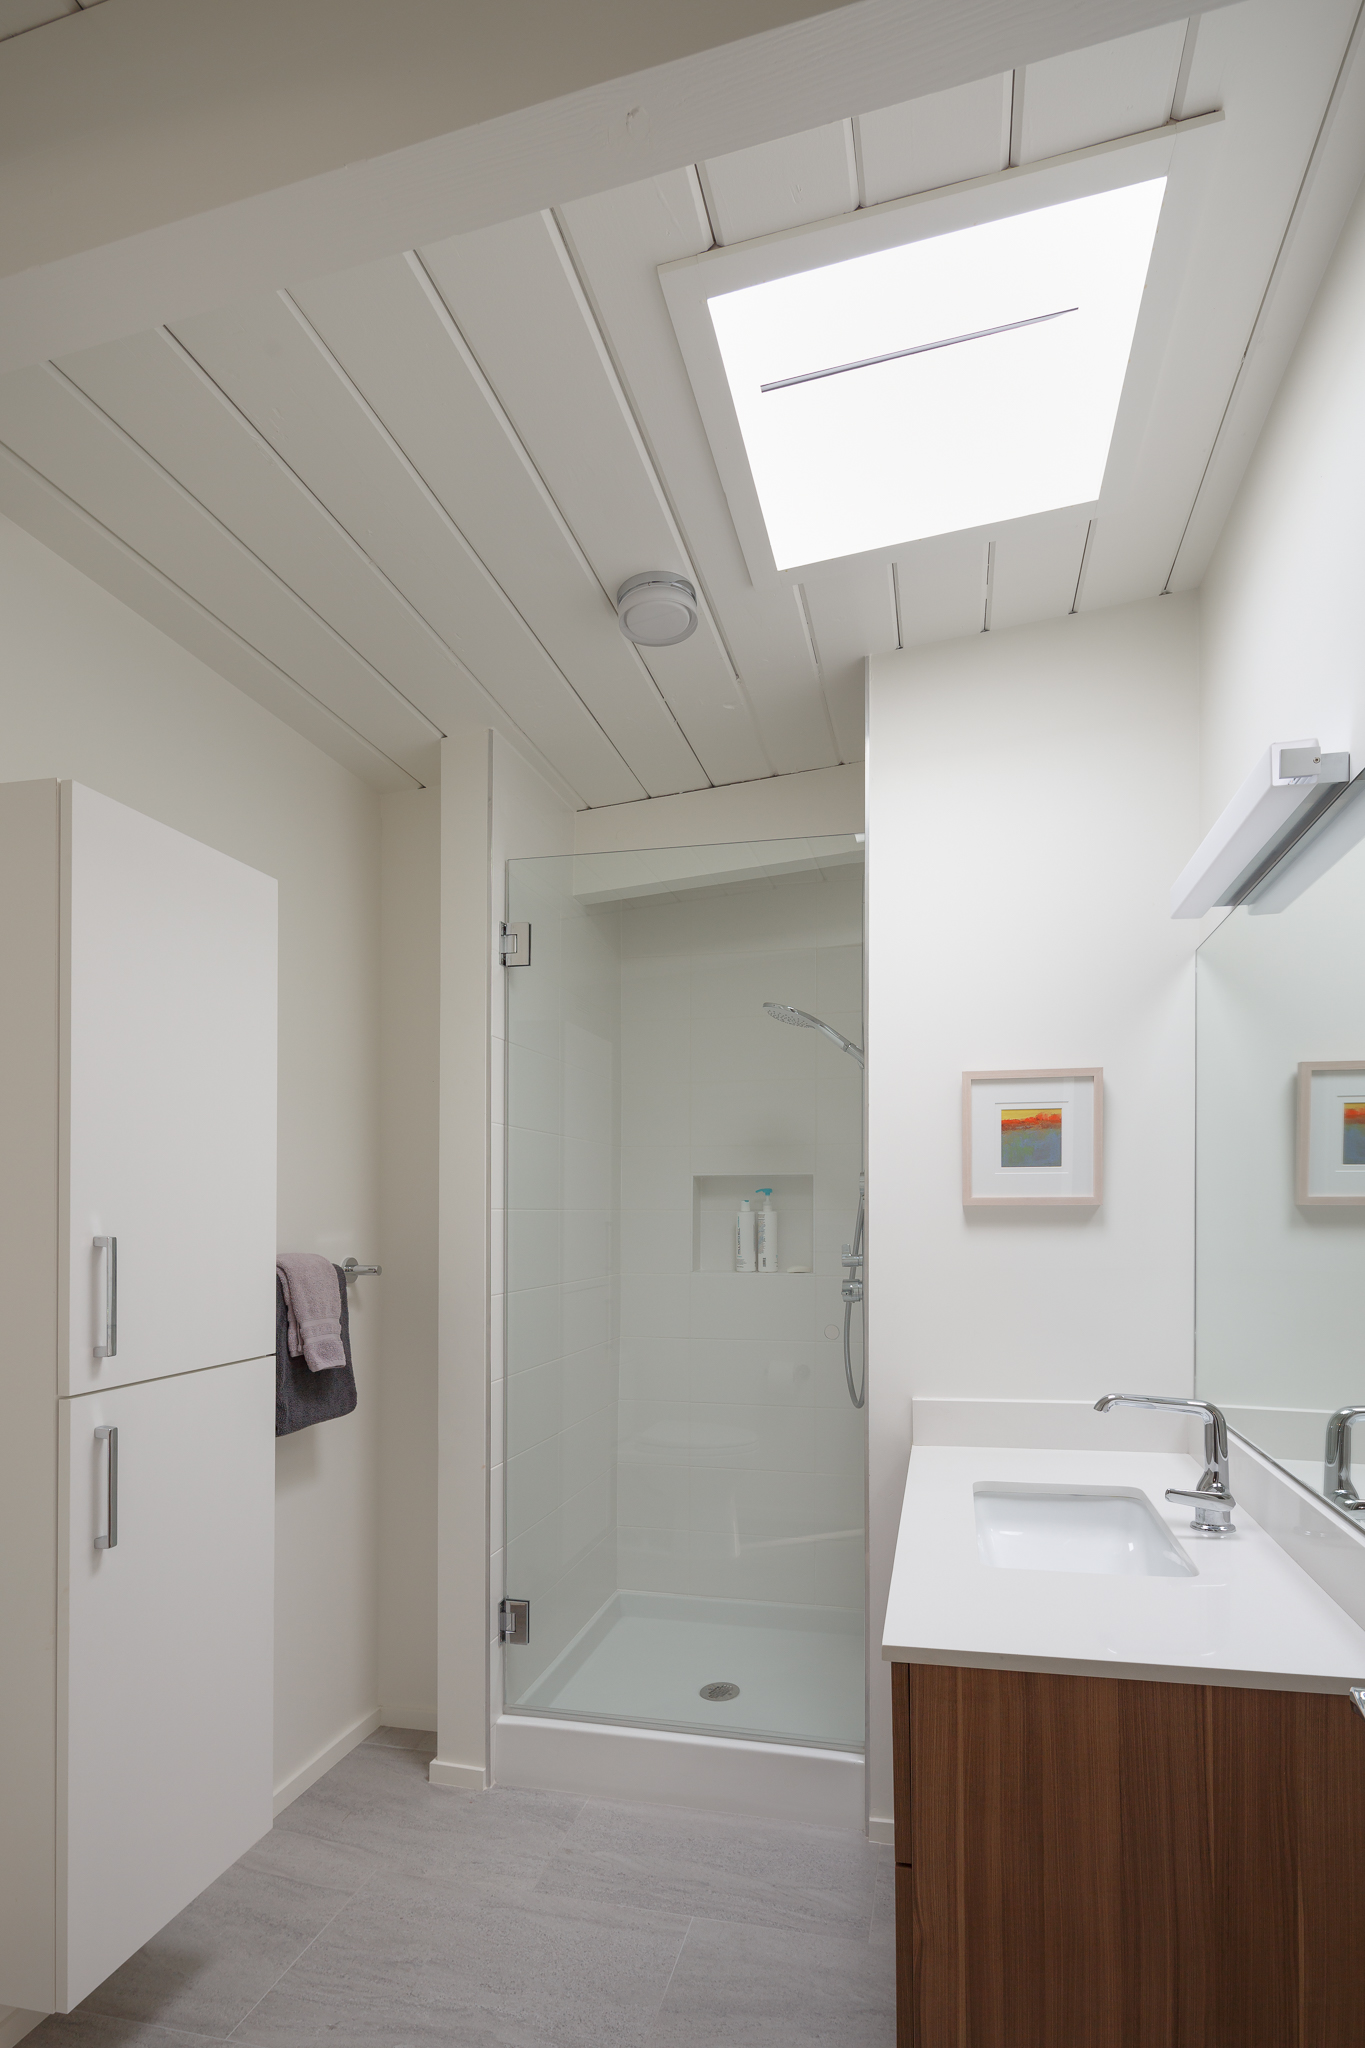 SFairfax-Finished-Bathroom2.jpg